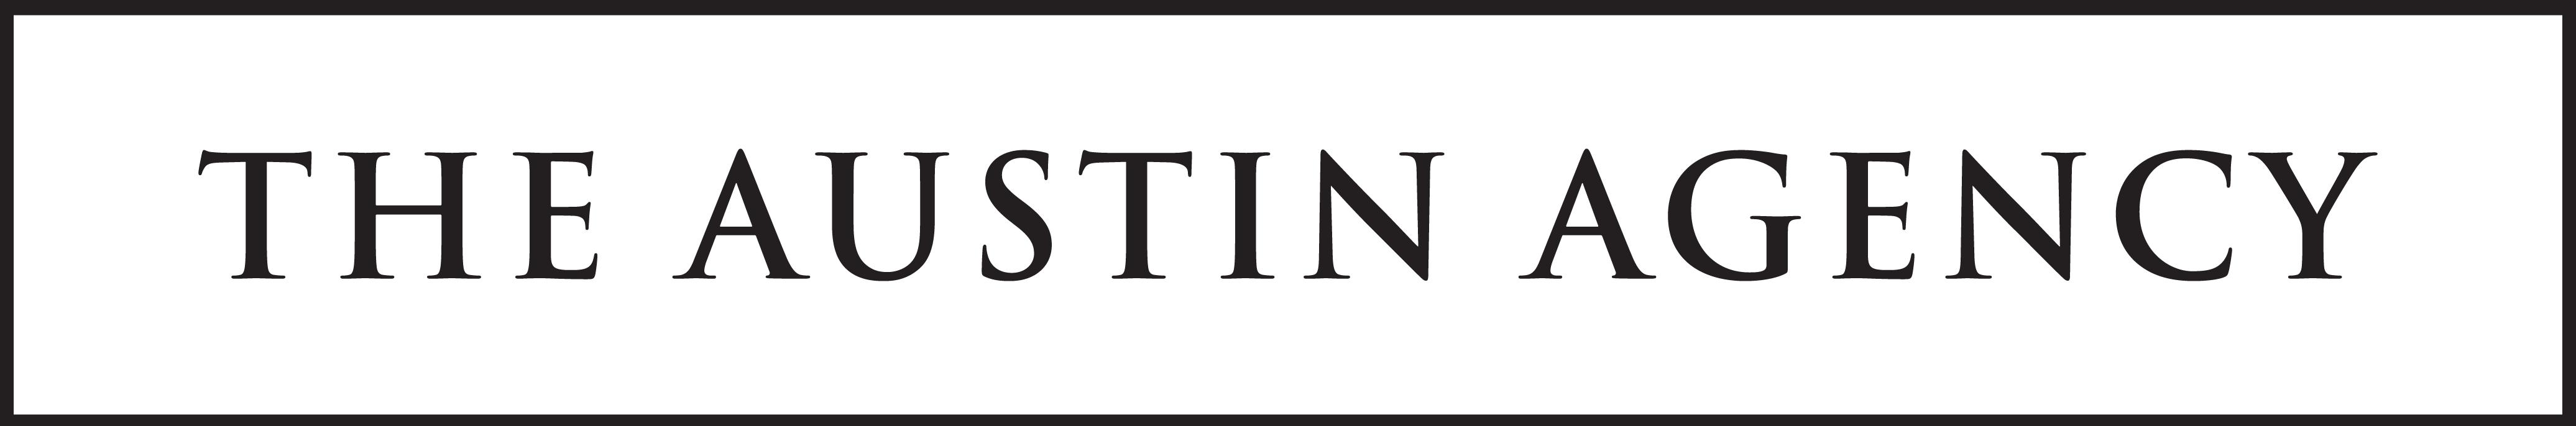 The Austin Agency